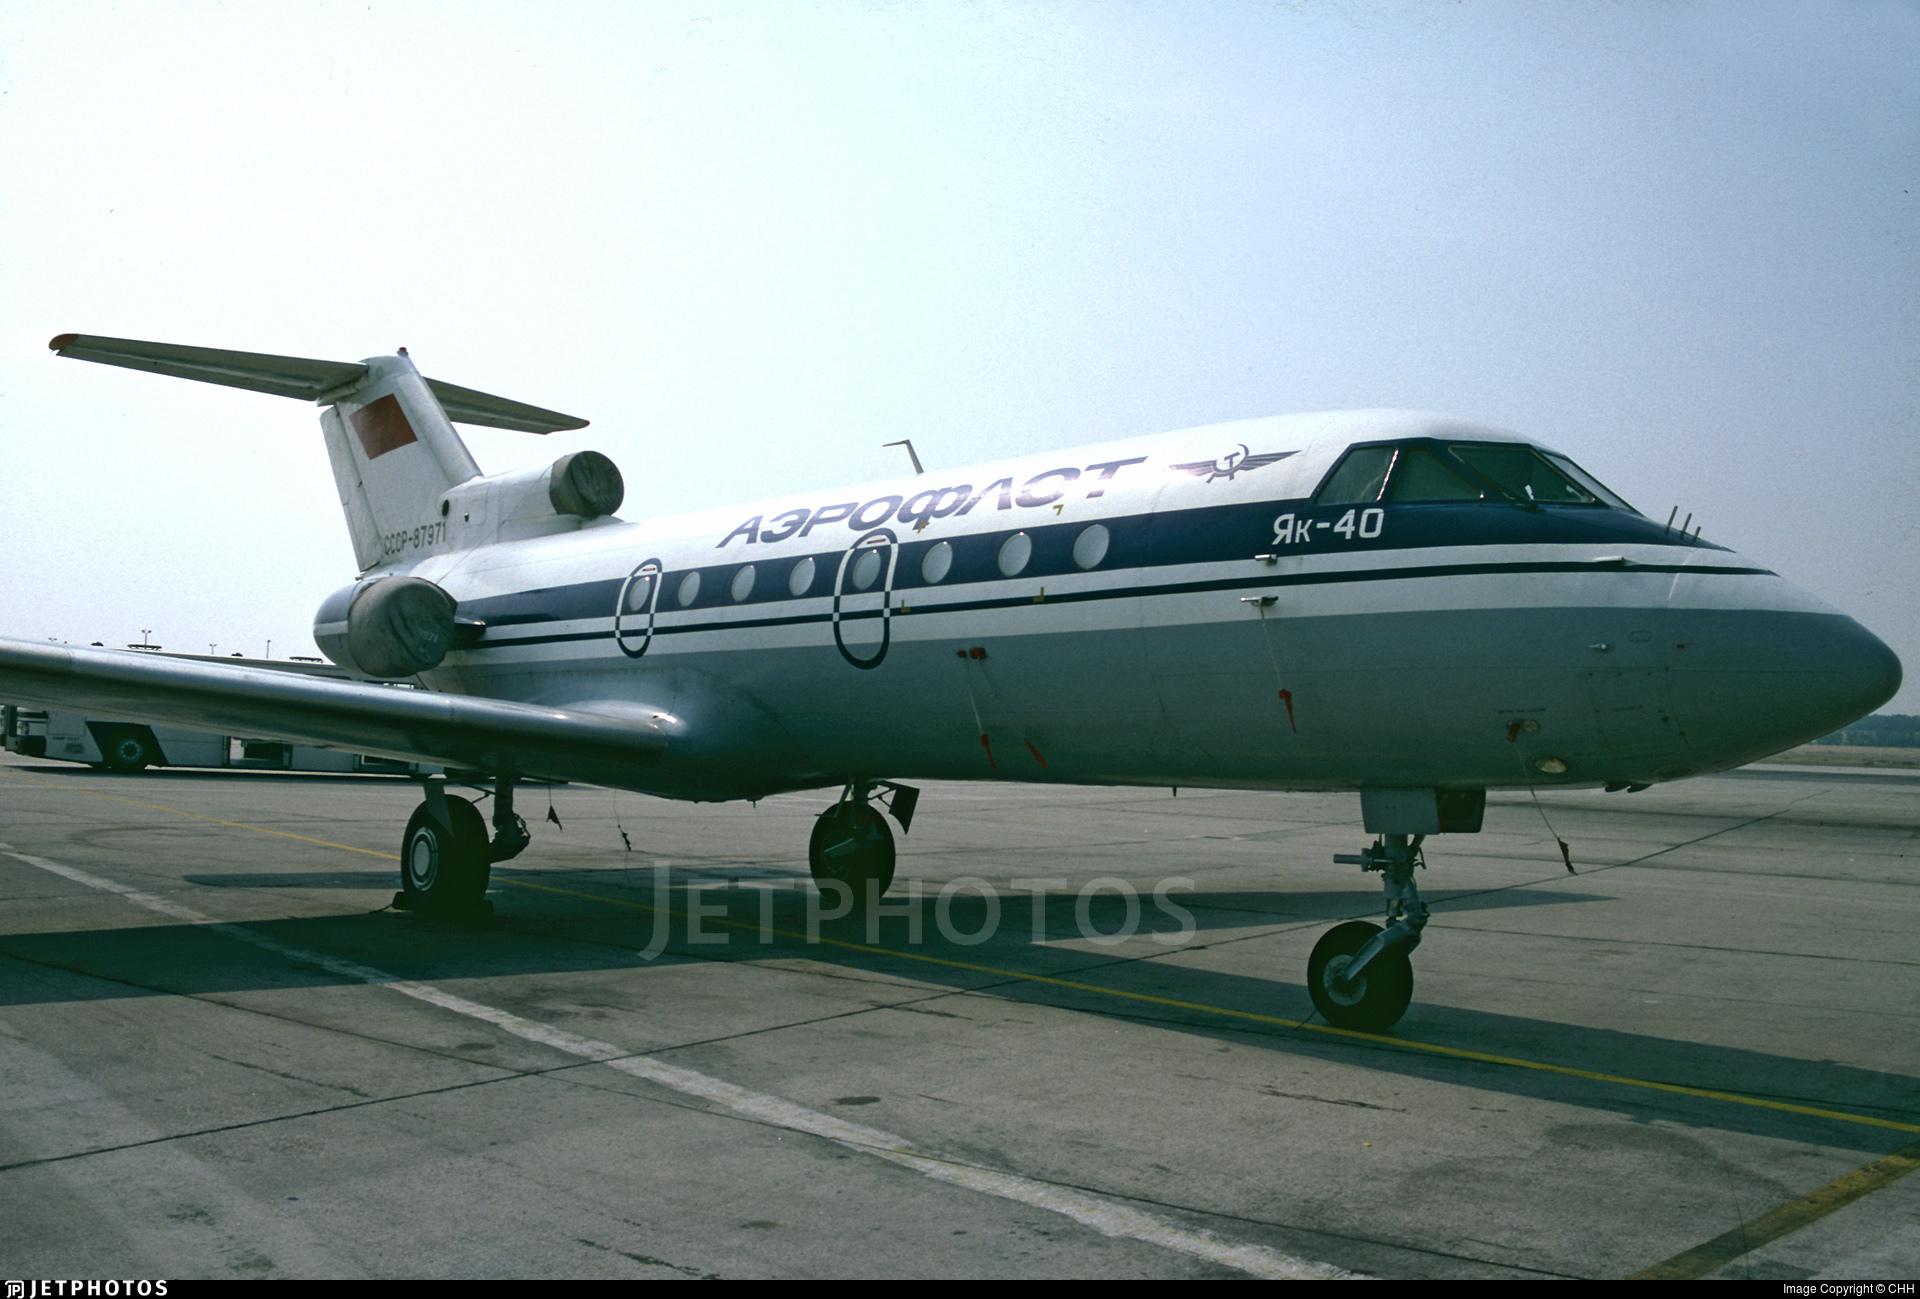 CCCP-87971 - Yakovlev Yak-40 - Aeroflot